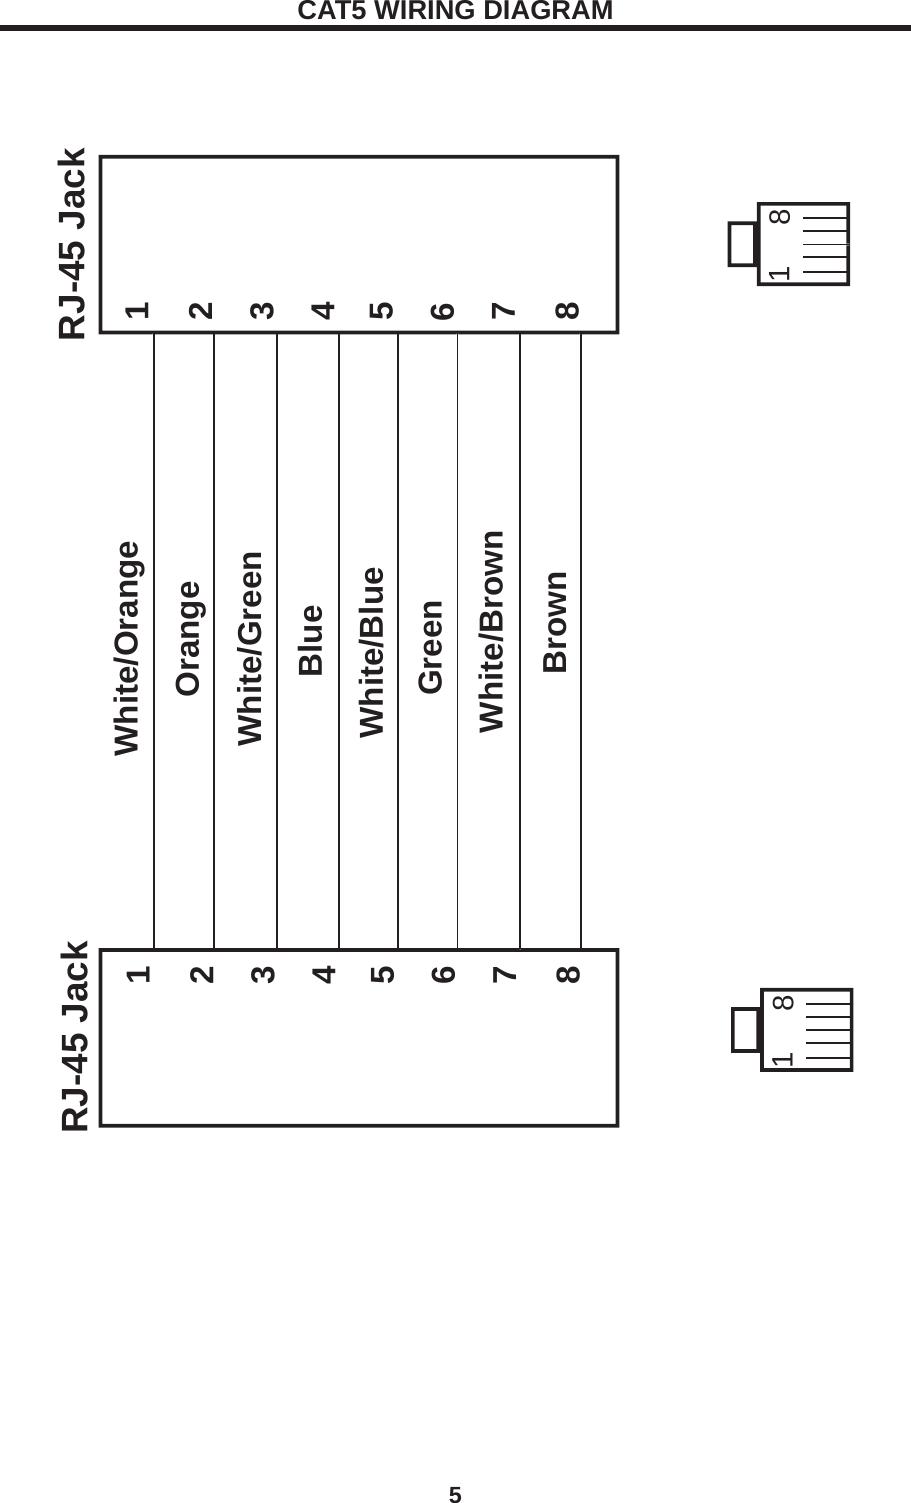 Pdf Ext Vga Audio 141 Manual User Cat5 Wiring Diagram Page 8 Of 12